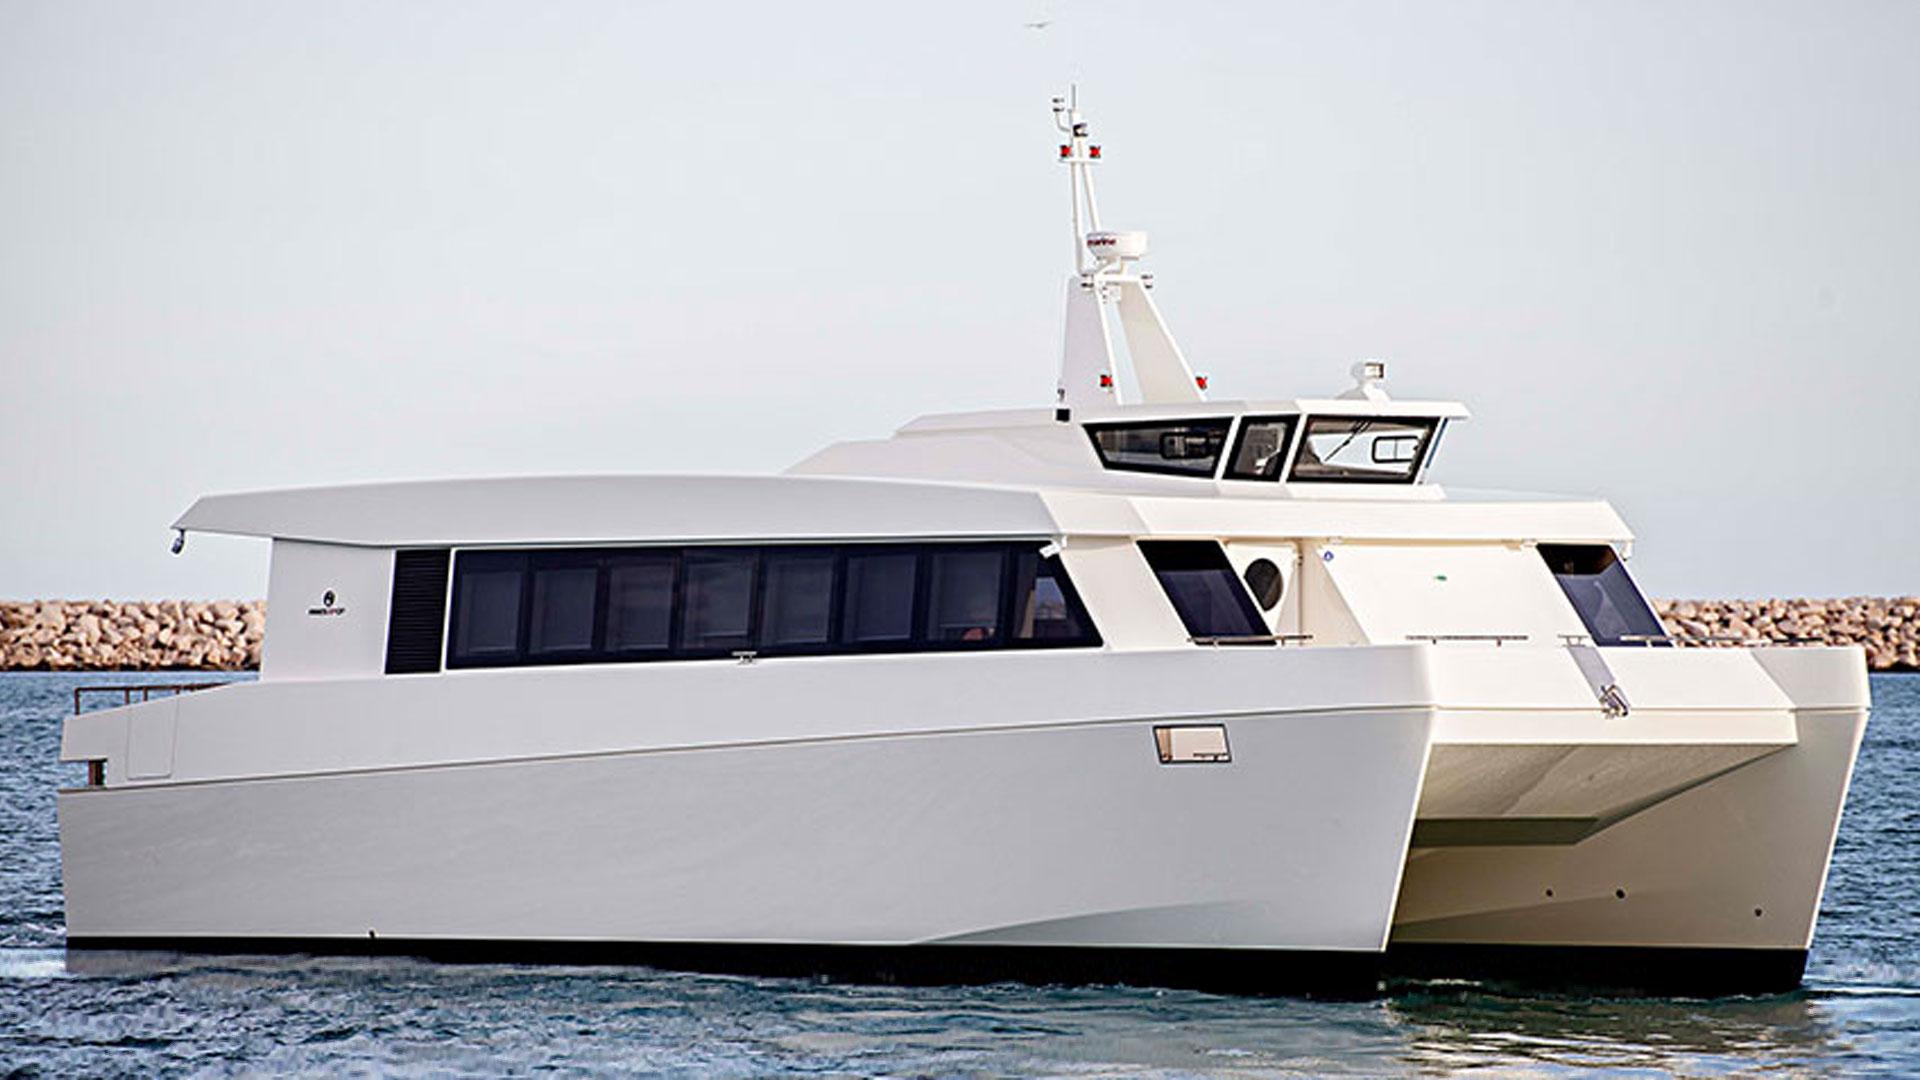 images/vessels/04-passenger-craft/04-ares-17-cf/01.jpg